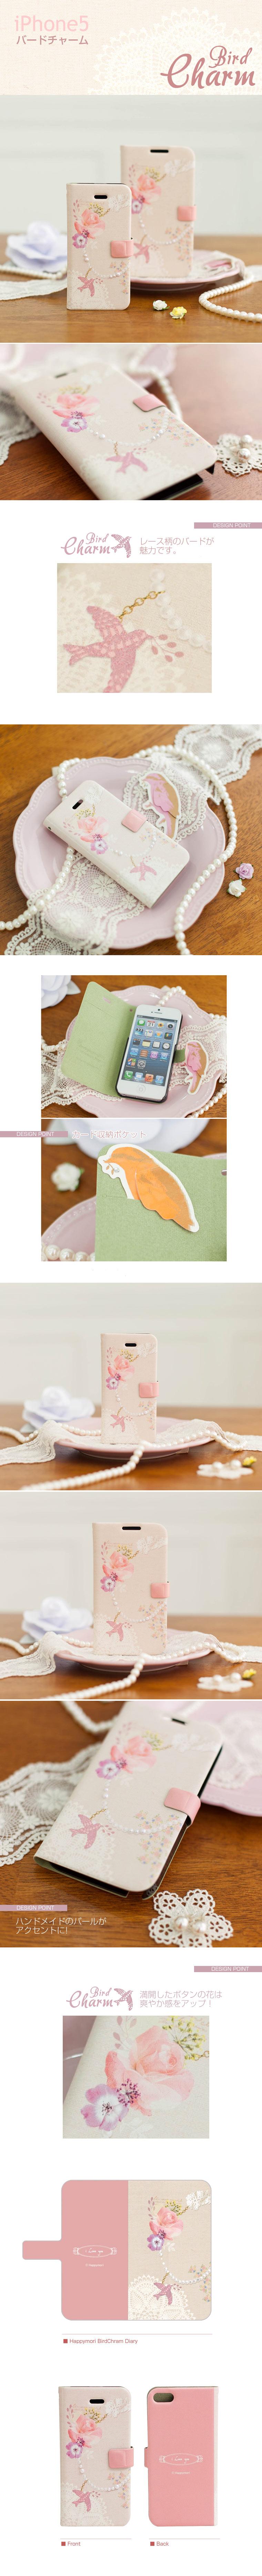 iPhone5 Bird Charm Diary (バードチャームダイアリー)